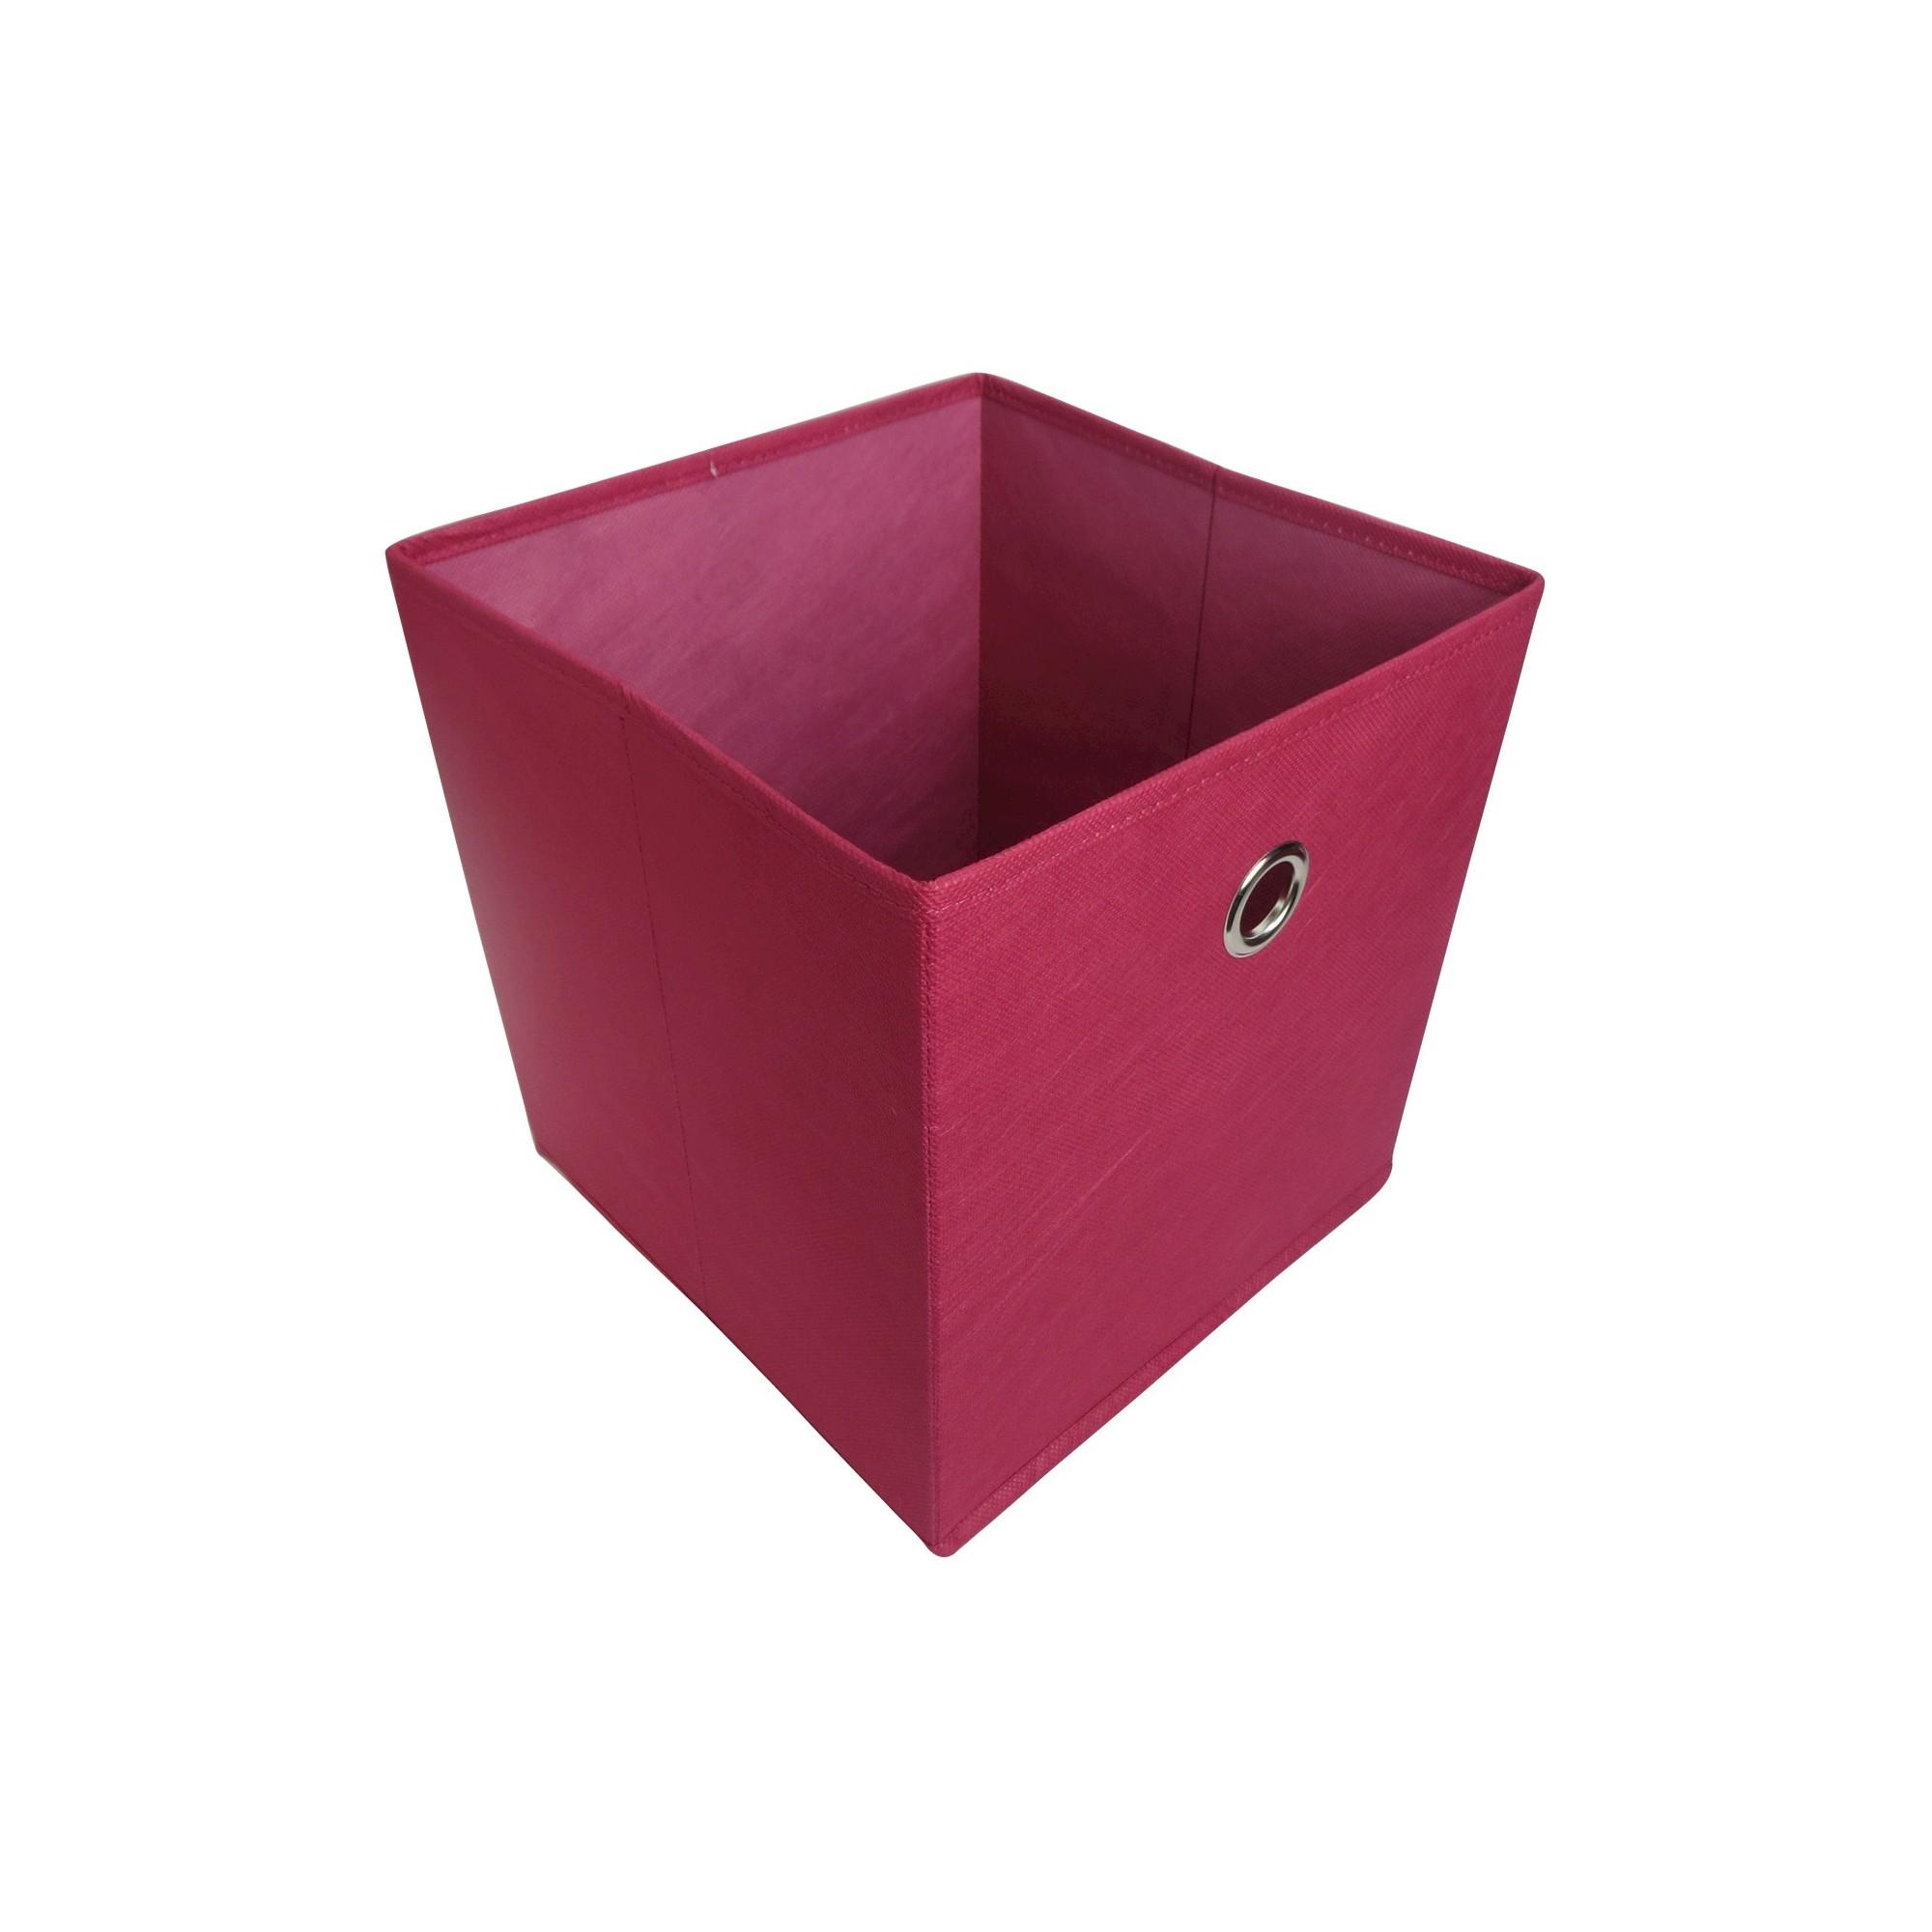 11 Fabric Cube Storage Bin Pink Room Essentials Decorative